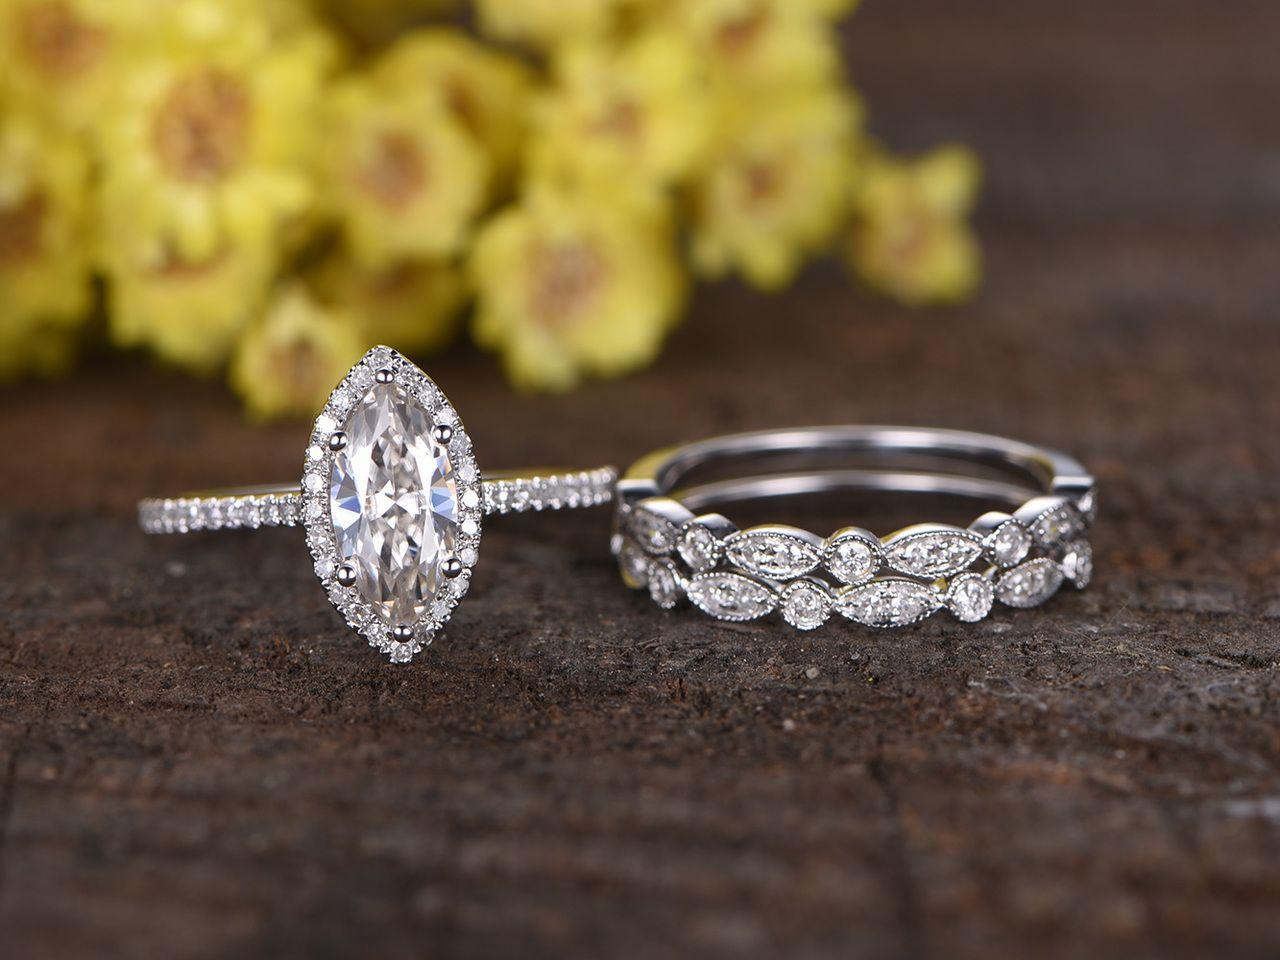 1 Carat G-h Diamond Milgraining Solitaire Bridal Ring Band Set 14k Yellow Gold Bridal & Wedding Party Jewelry Engagement & Wedding